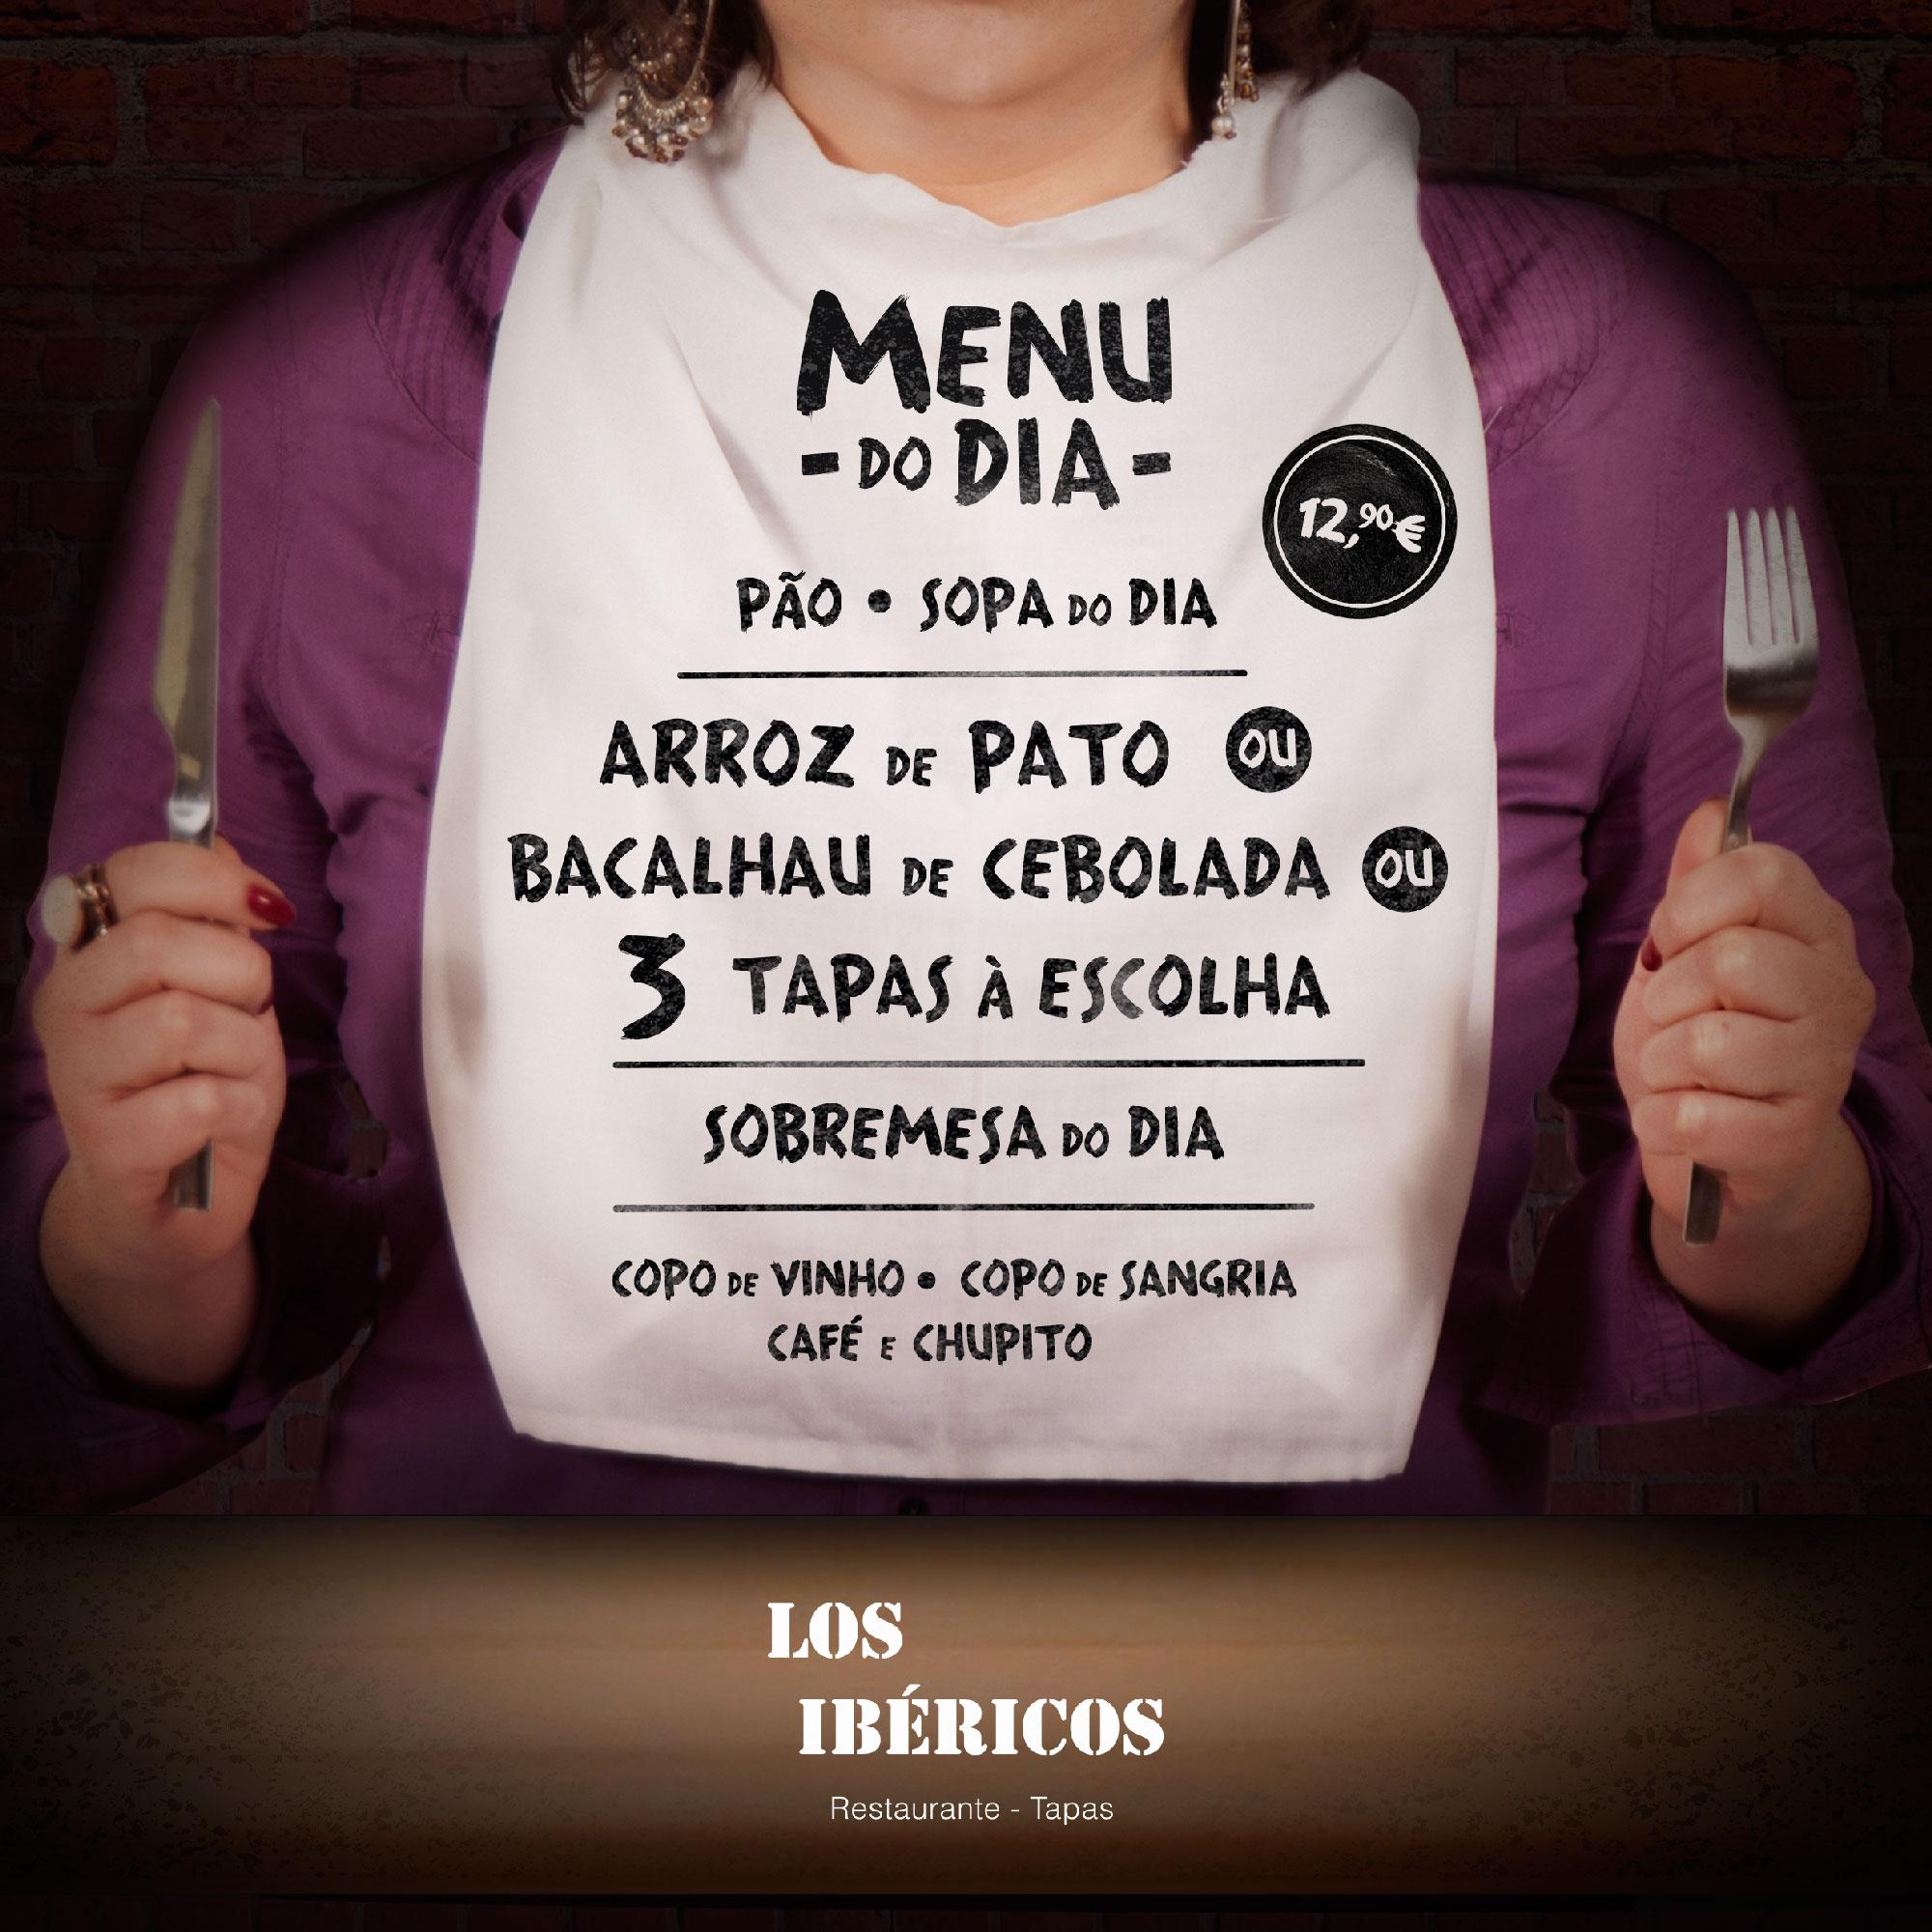 LOSIBERICOS_MENU_DIA_segunda